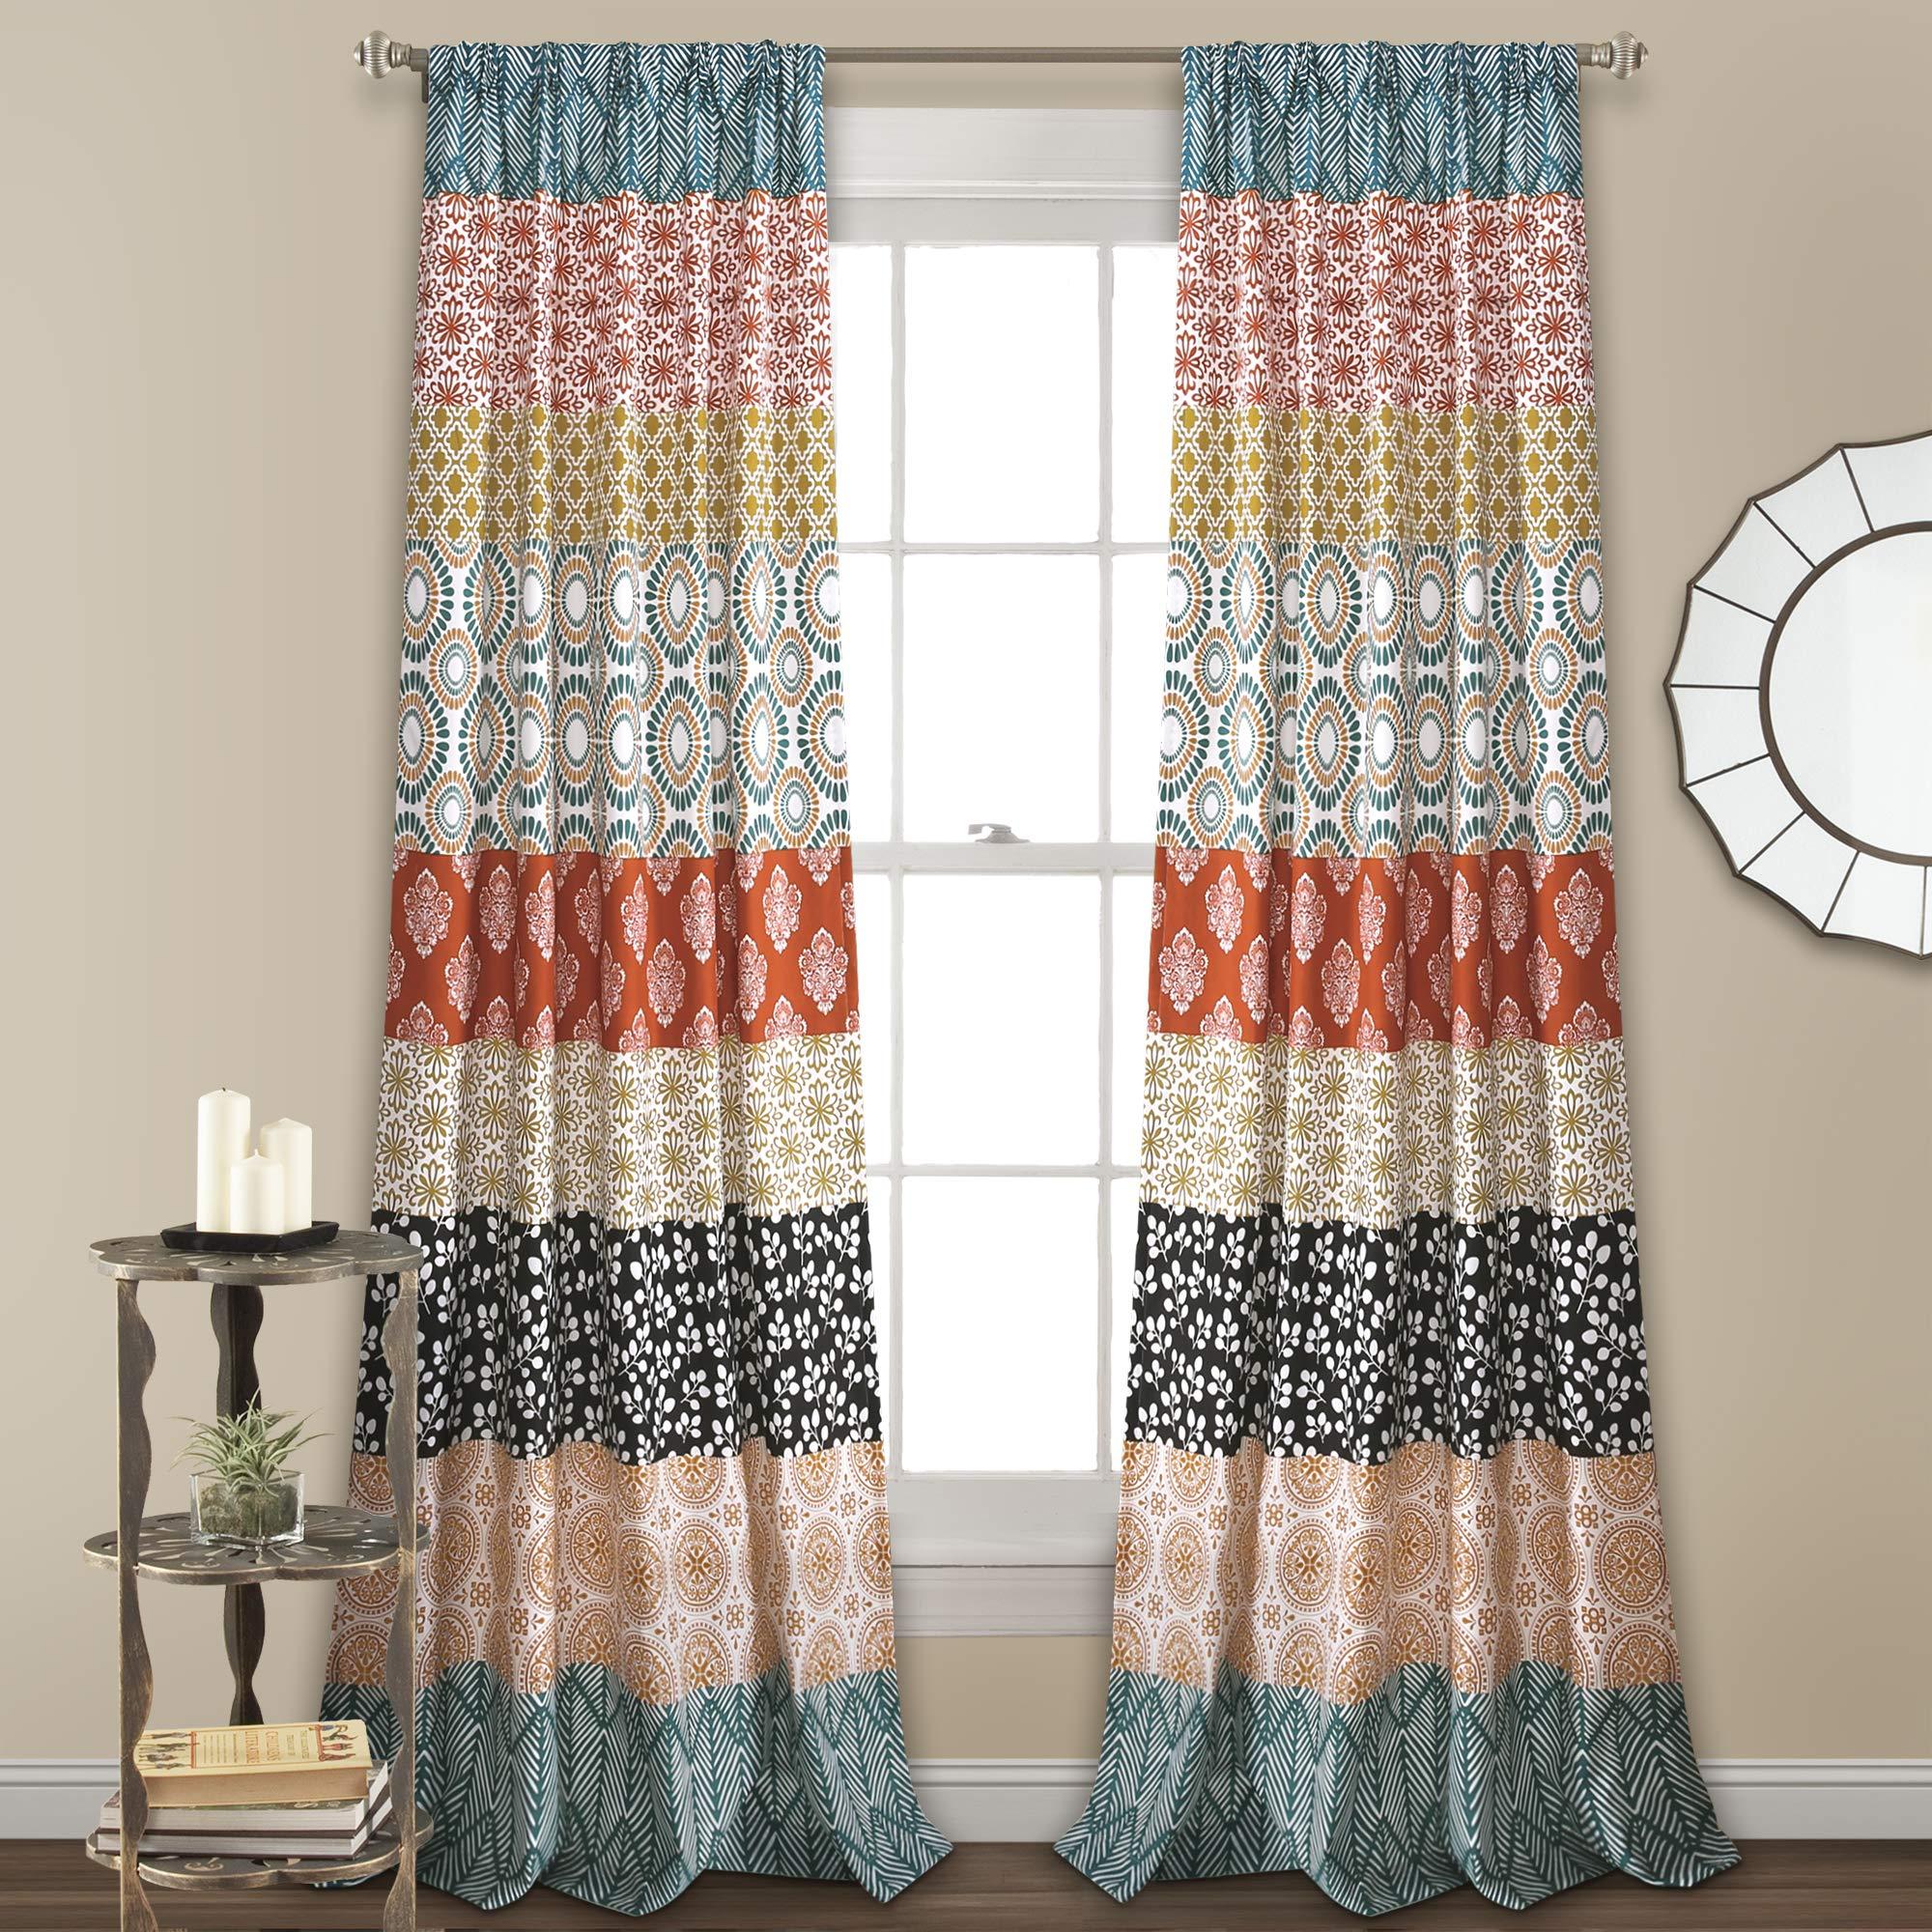 Lush Decor Bohemian Curtain Turquoise